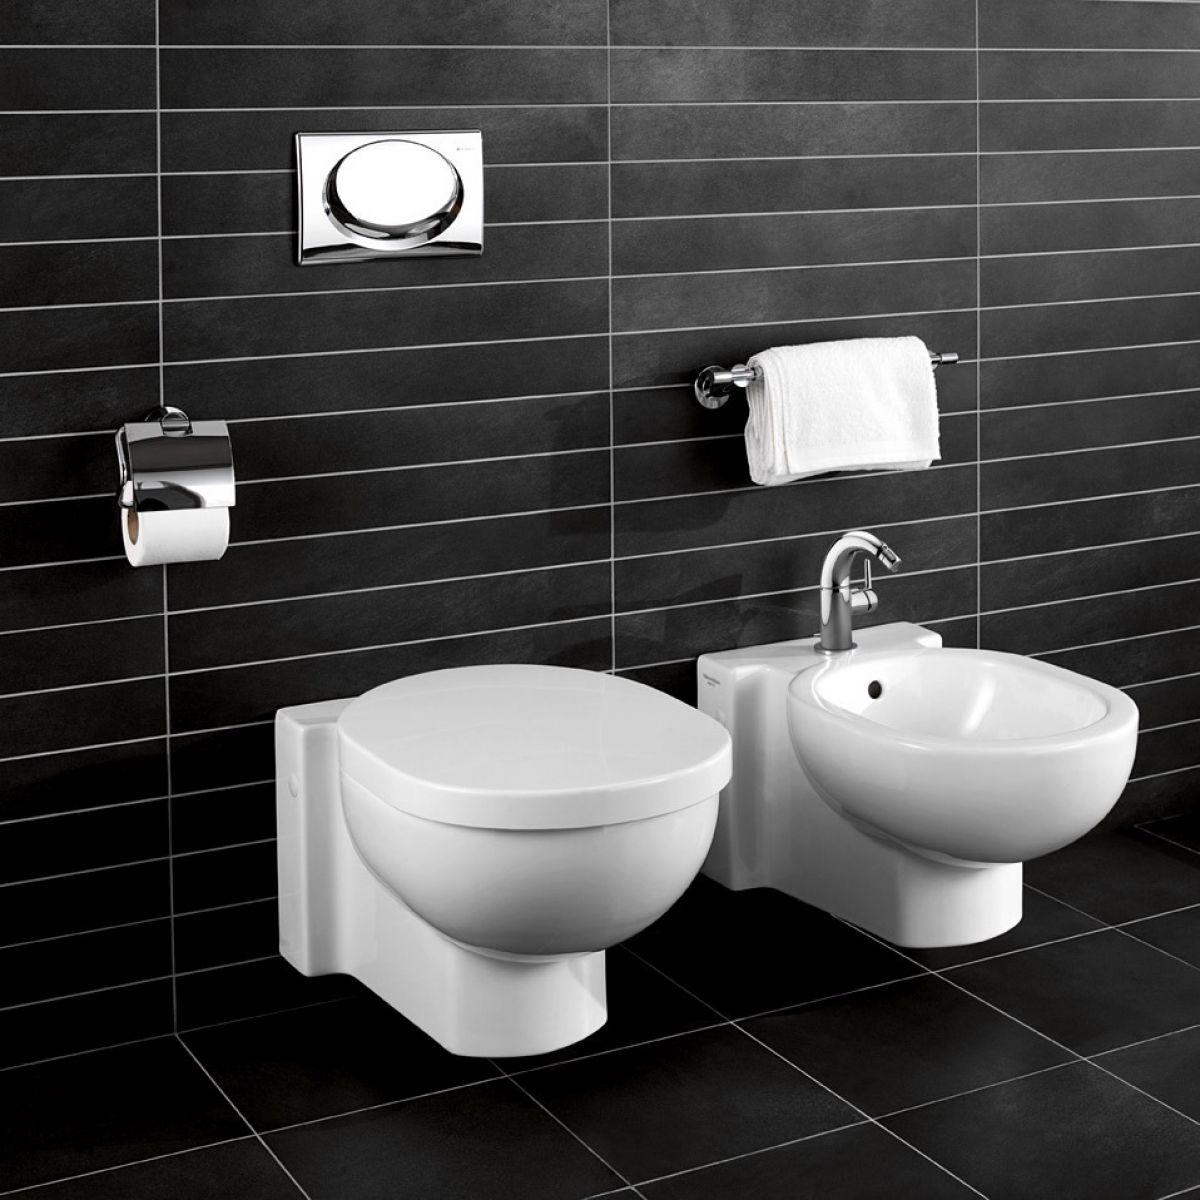 Bathroom Tiles Villeroy Boch villeroy & boch bernina tiles 2408 (10 x 30cm) | bad | pinterest